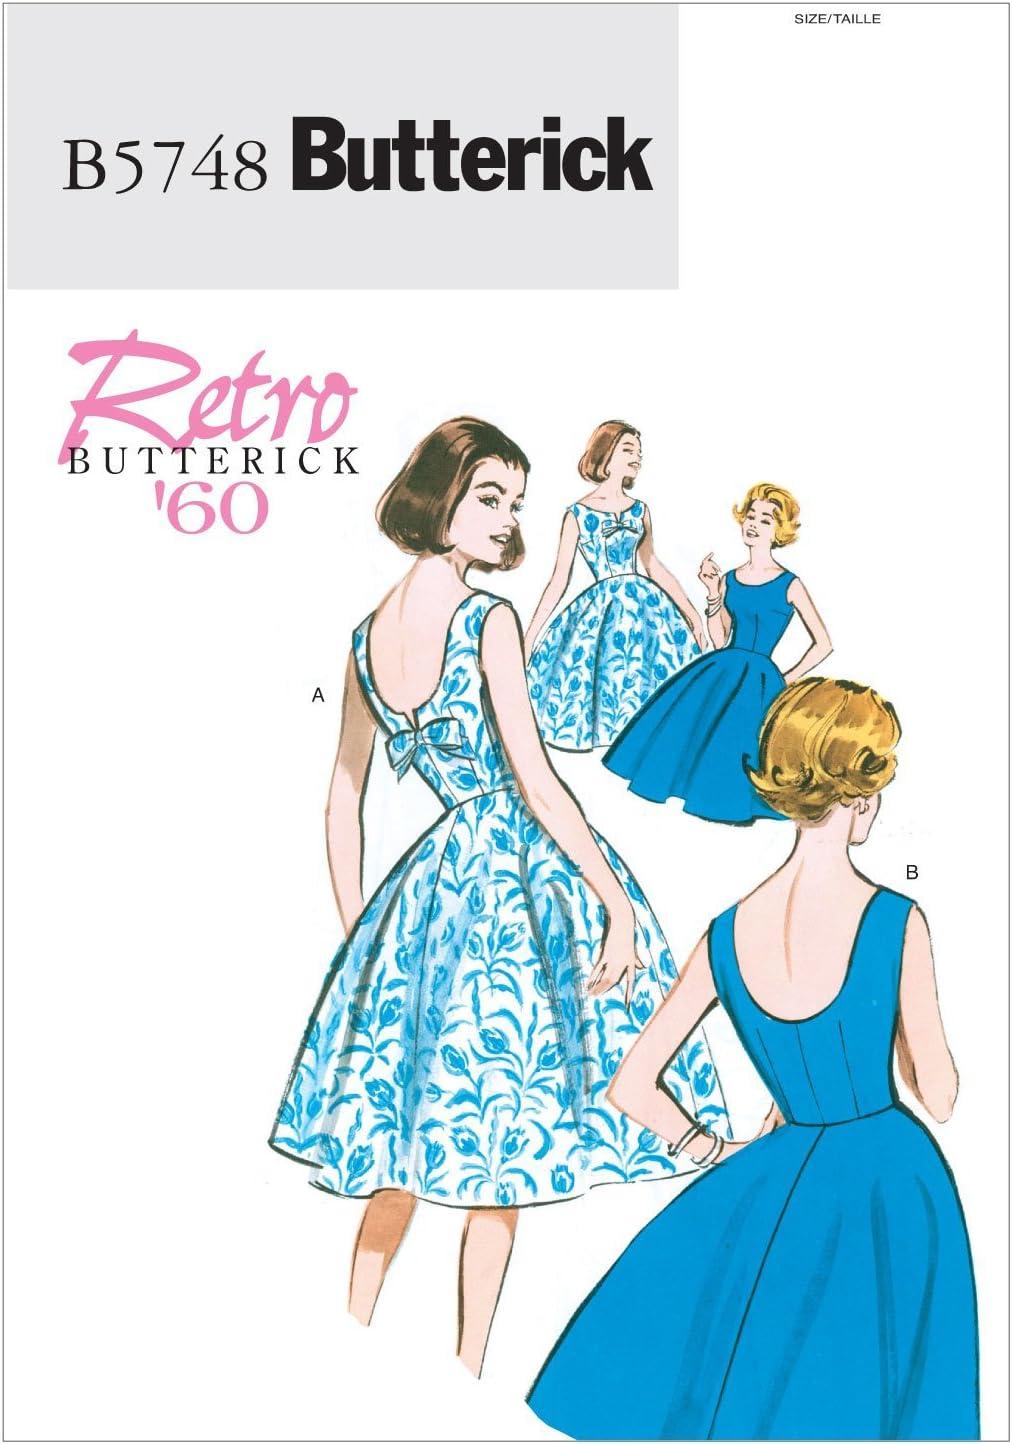 BUTTERICK PATTERNS B5748 Misse/Misse Petite Dress, Size A5 (6-8-10-12-14)